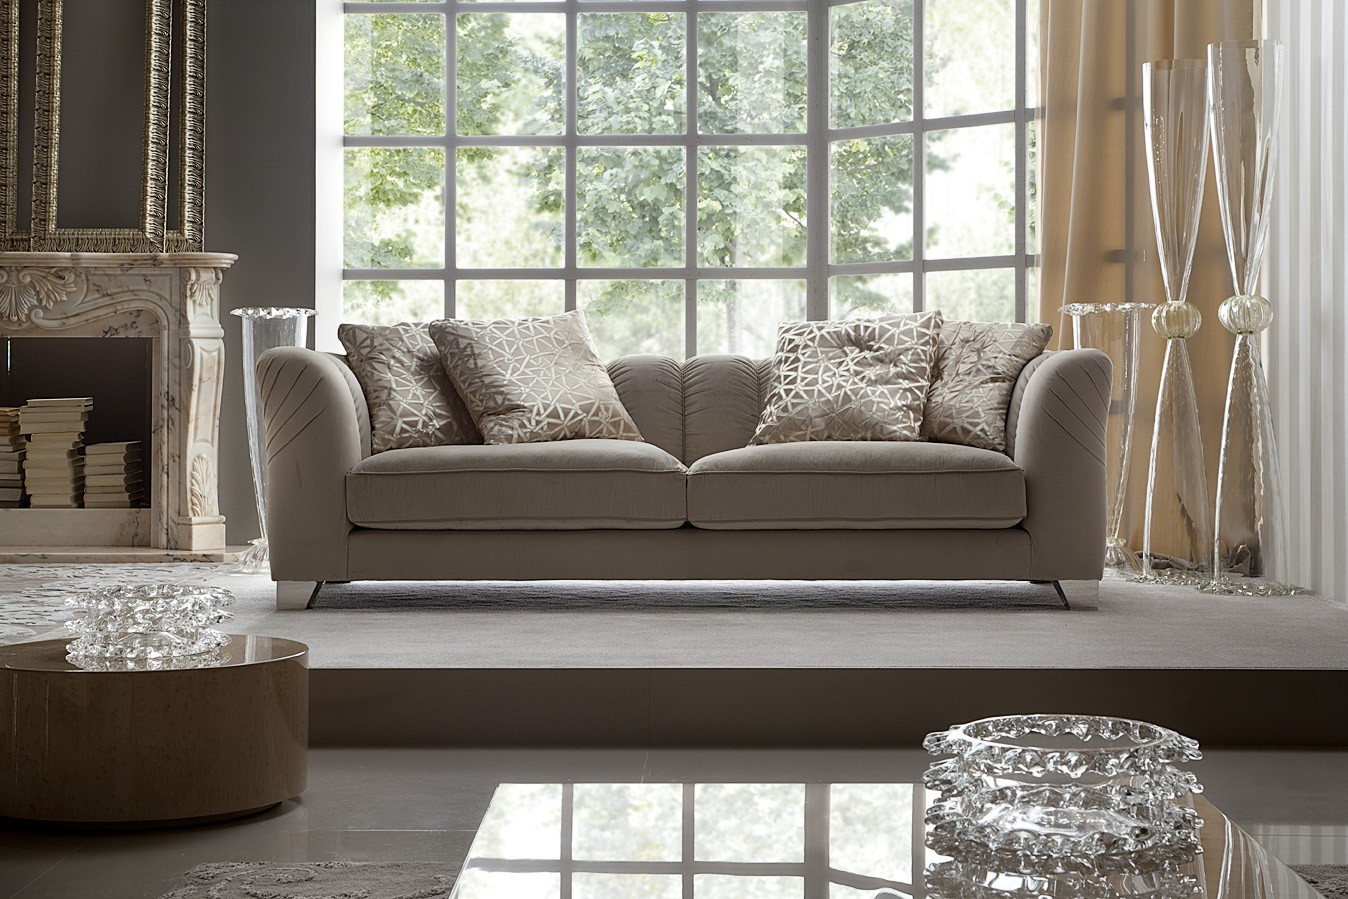 Design Of Living Room Modern | Living Room Interior Designs